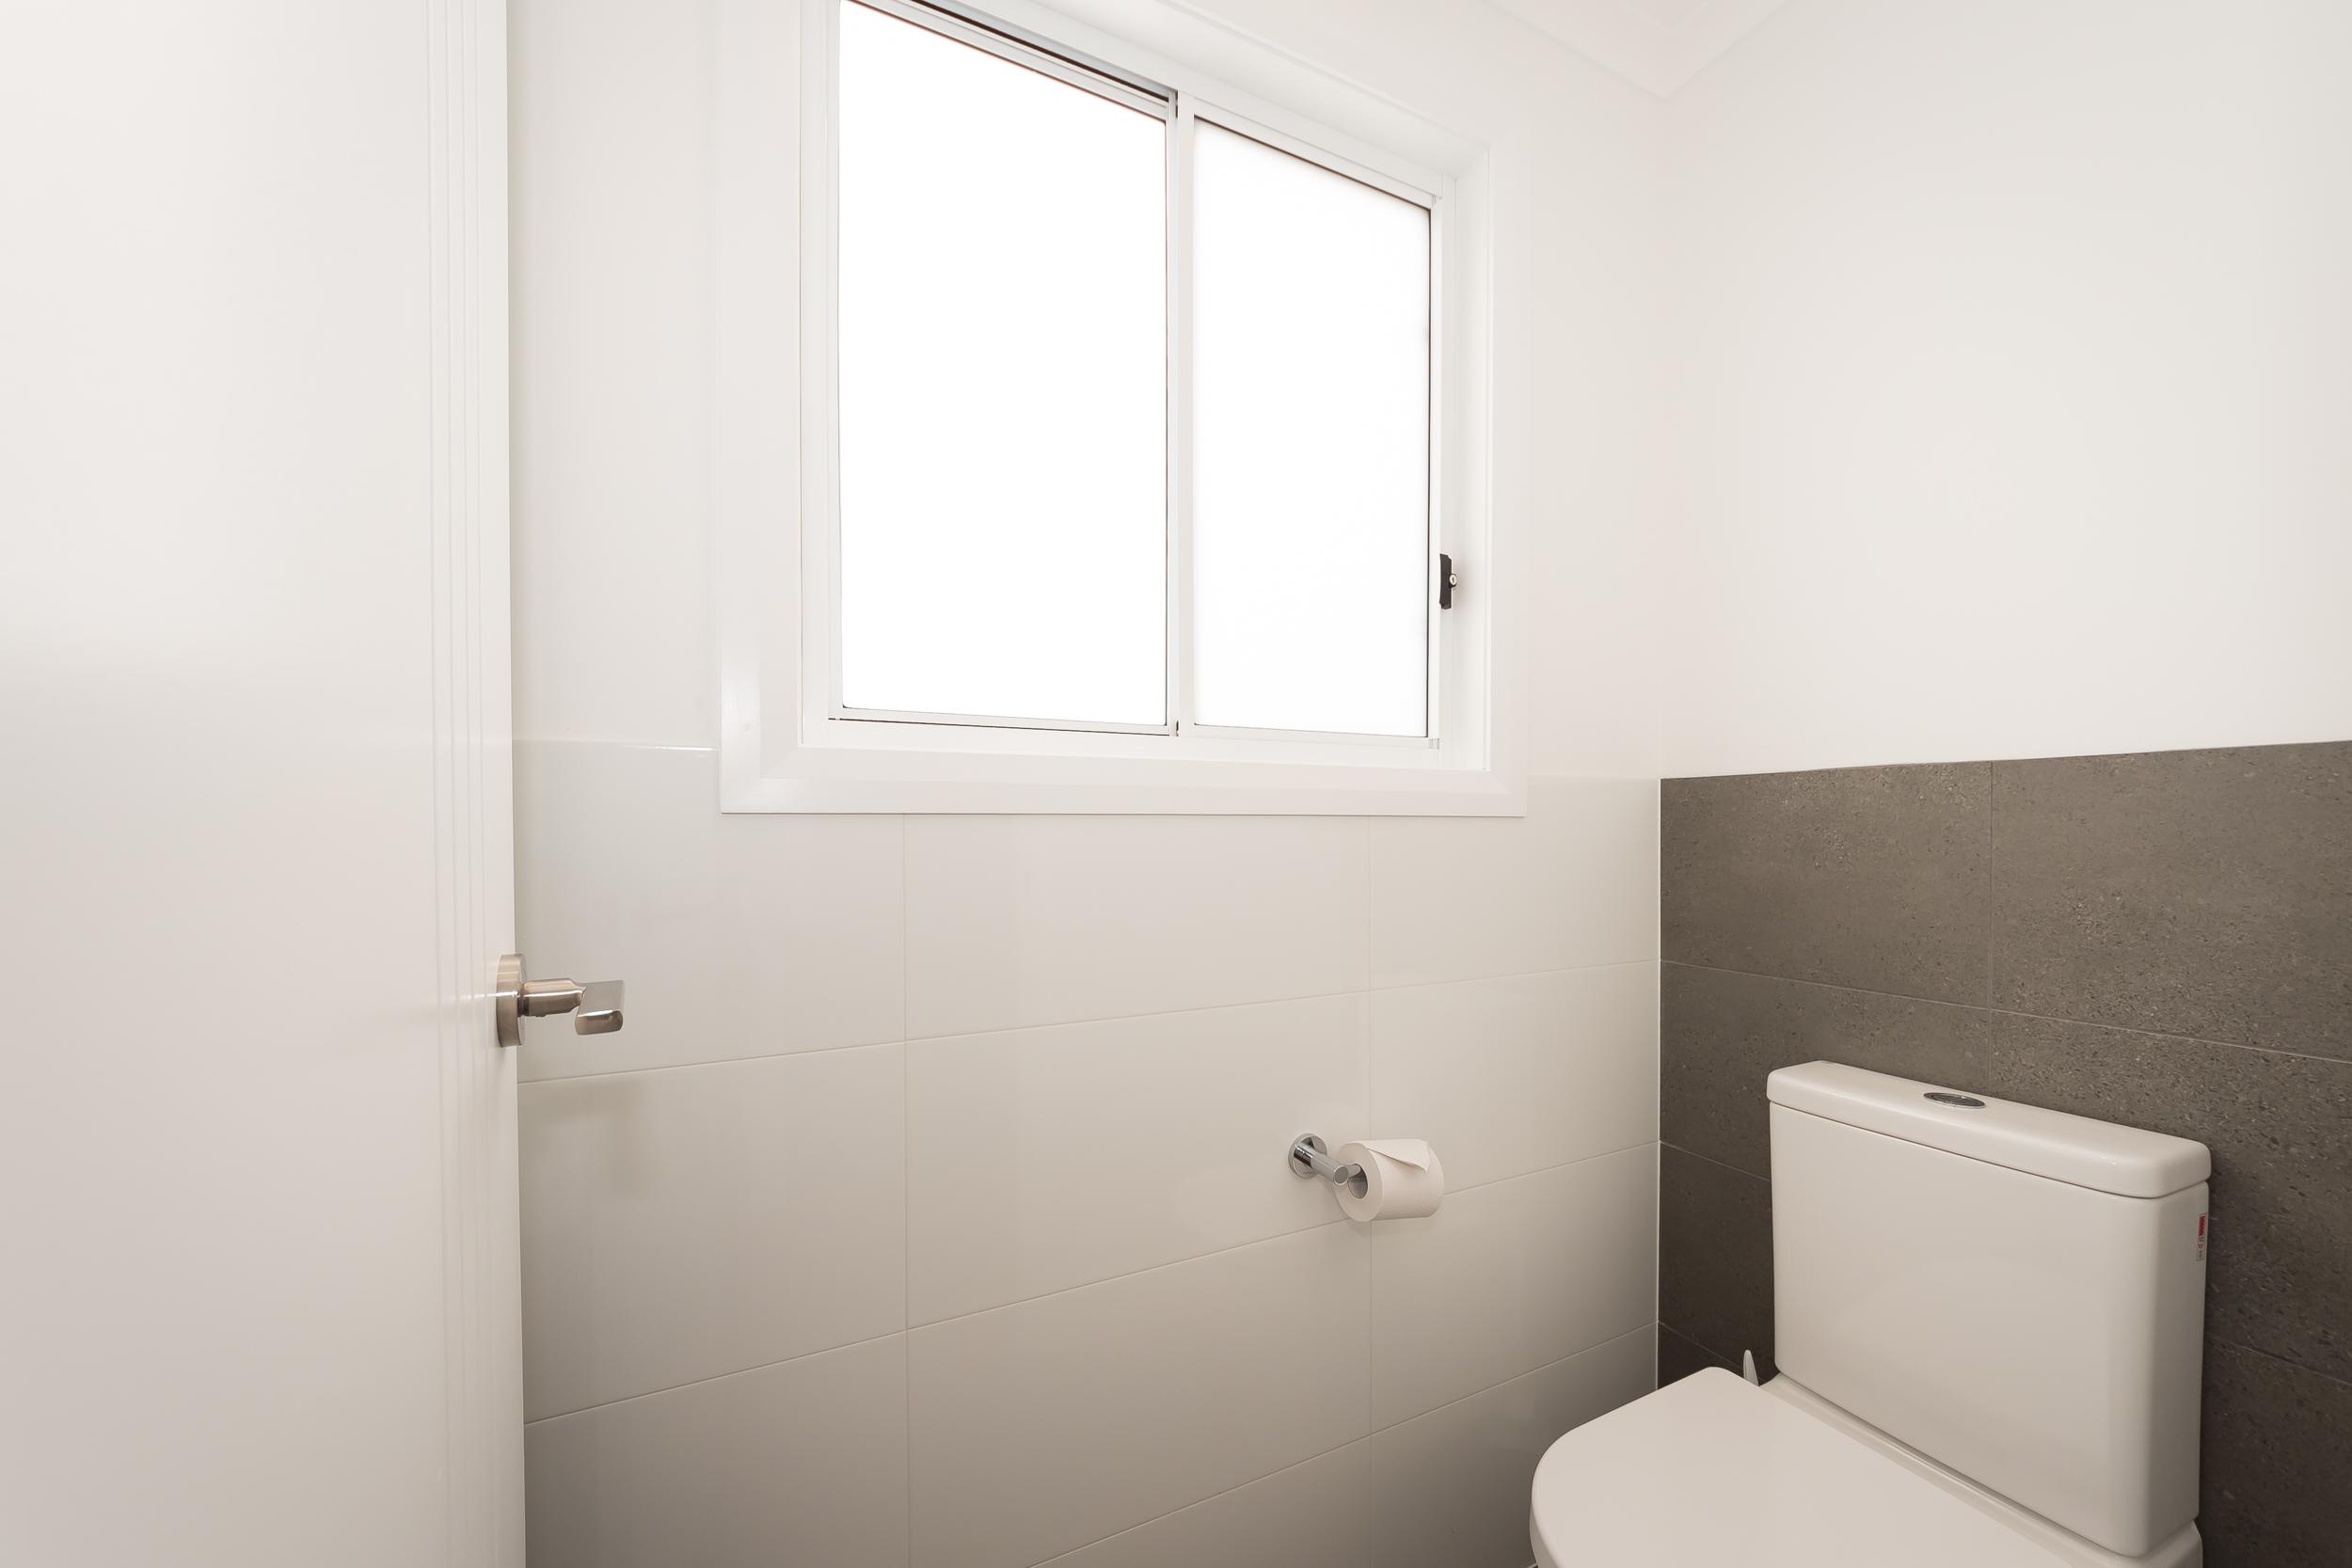 Cabin toilet